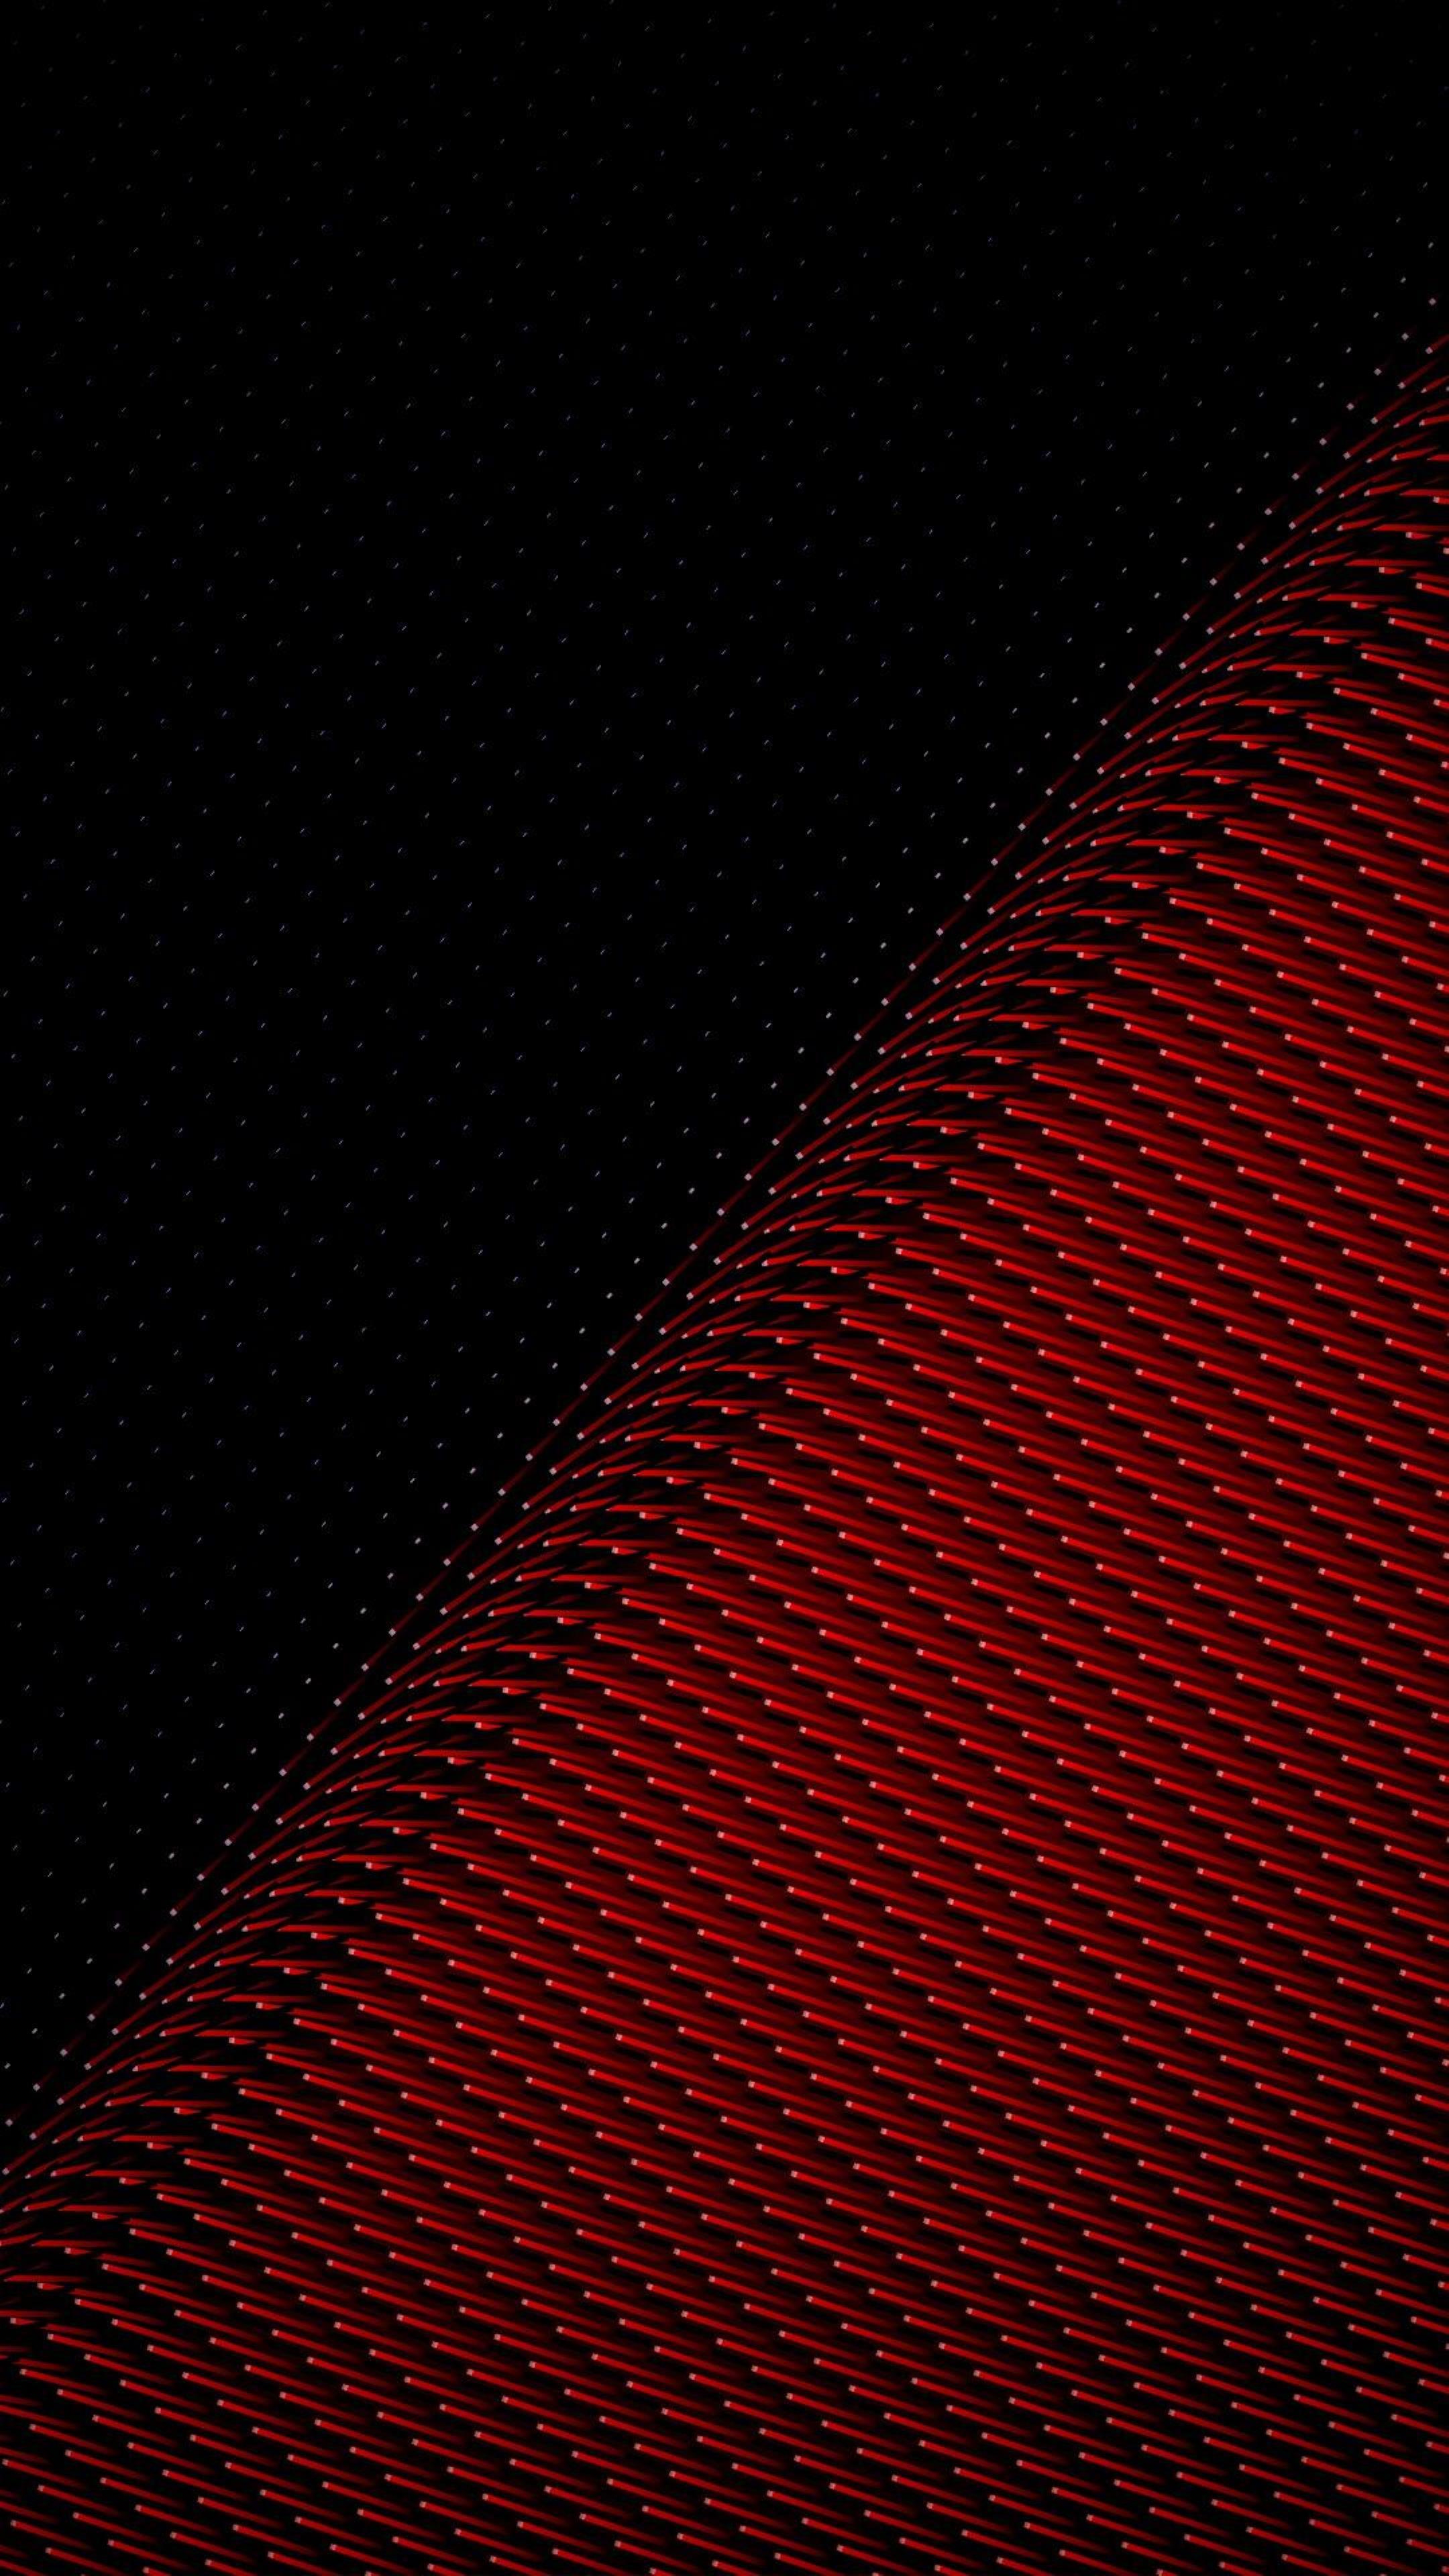 Pin By John Zippo On Dark Wallpaper In 2020 Black Wallpaper Iphone Dark Iphone Wallpaper Images Black Wallpaper Iphone